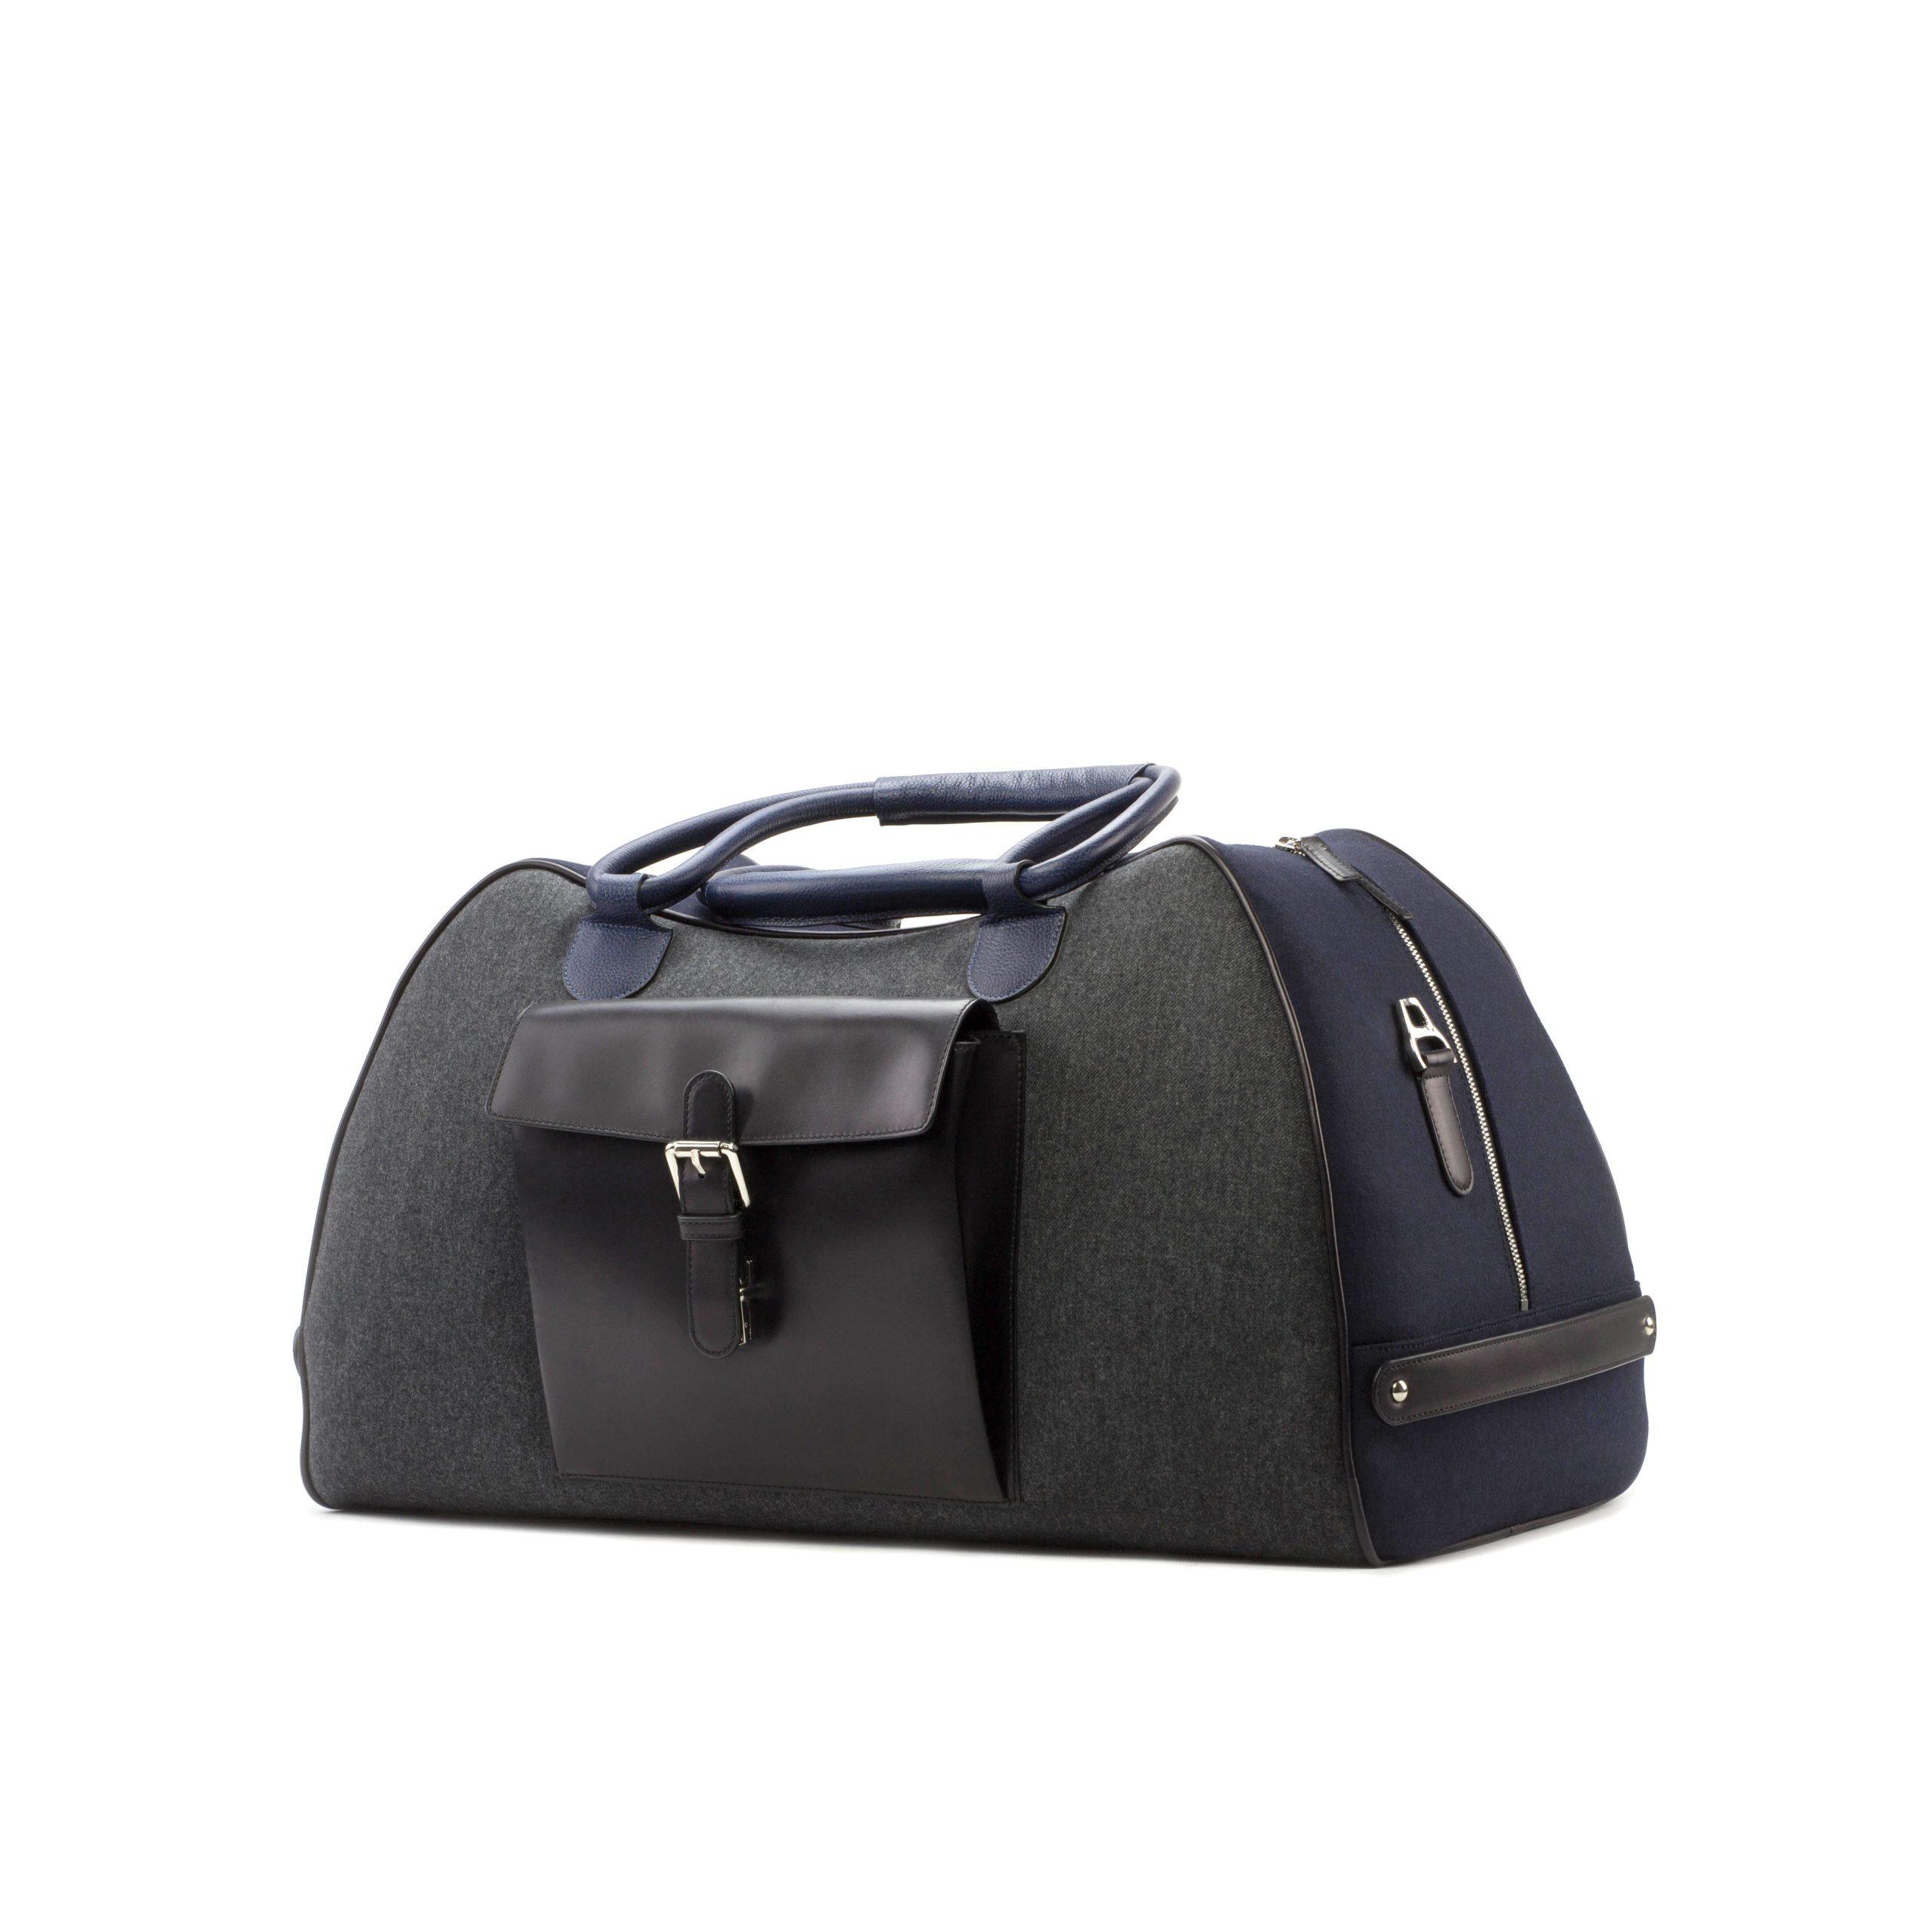 Travel Duffle - Flannel dark Grey-Flannel Navy-Painted Calf Black-Painted Full Grain Navy-Ang2